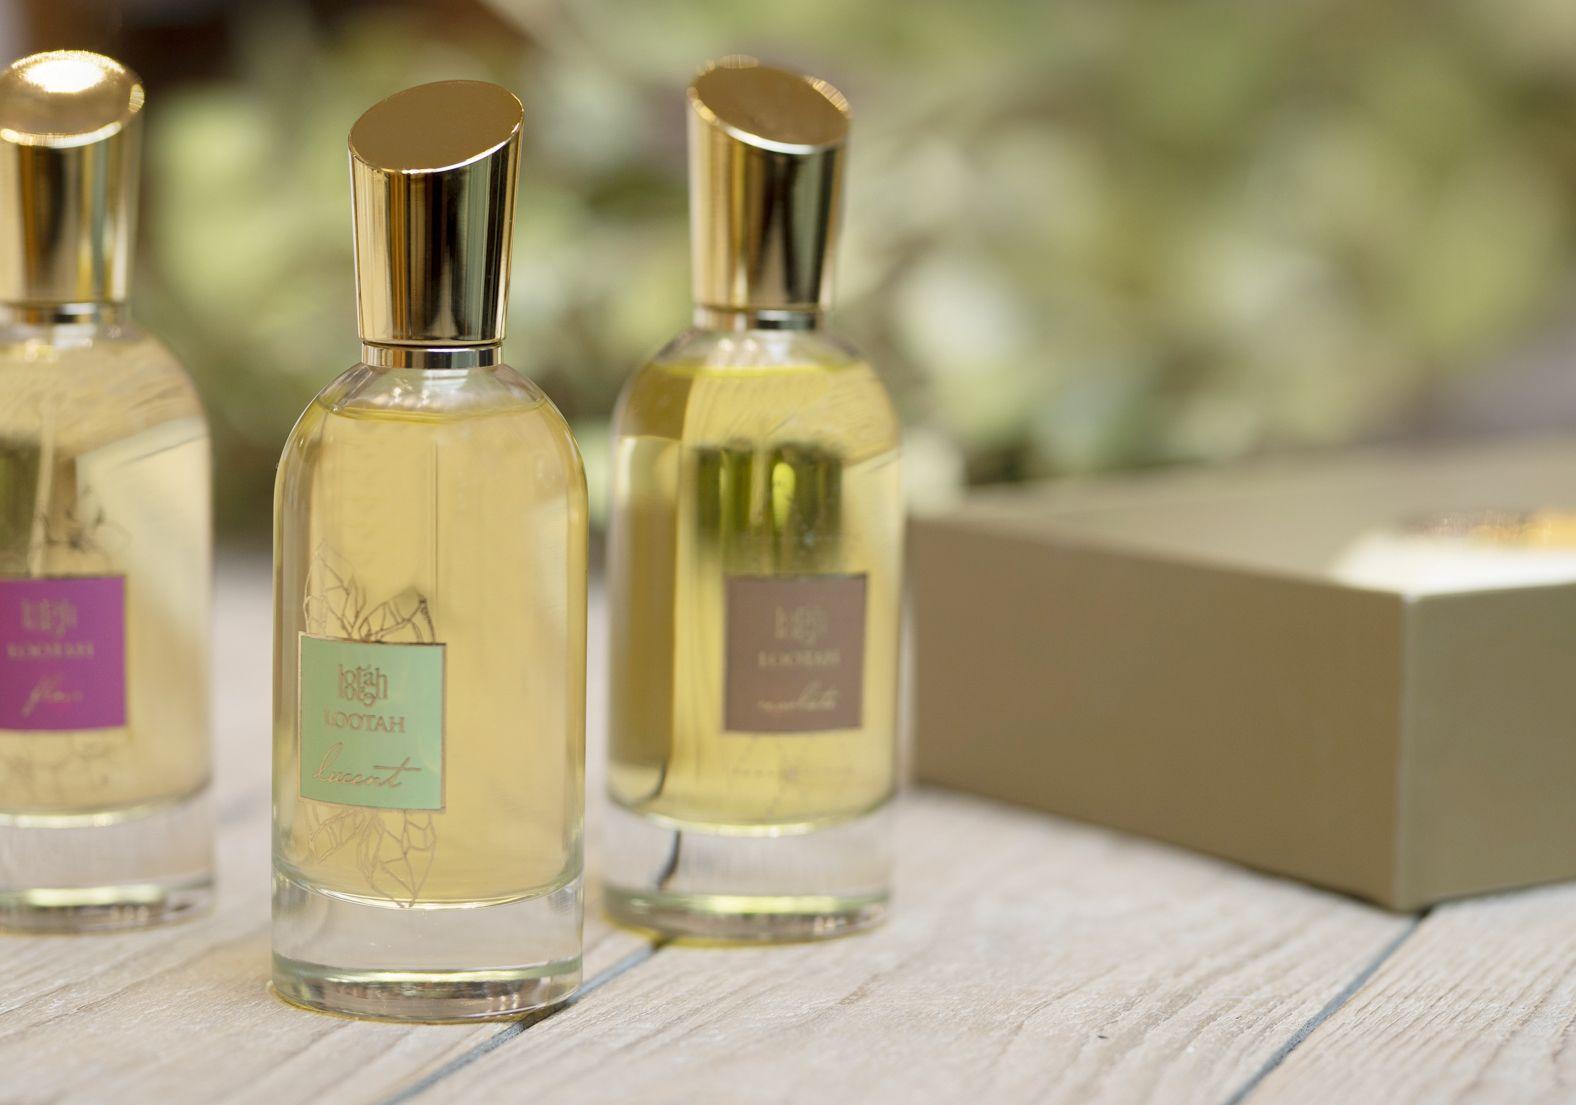 من كل بستان زهرة ومن كل عطر قطرة مجموعة العطور من لوتاه You Pick Your Bouquet Rose By Rose And We Pick Our Perfumes D Perfume Perfume Bottles Fragrance